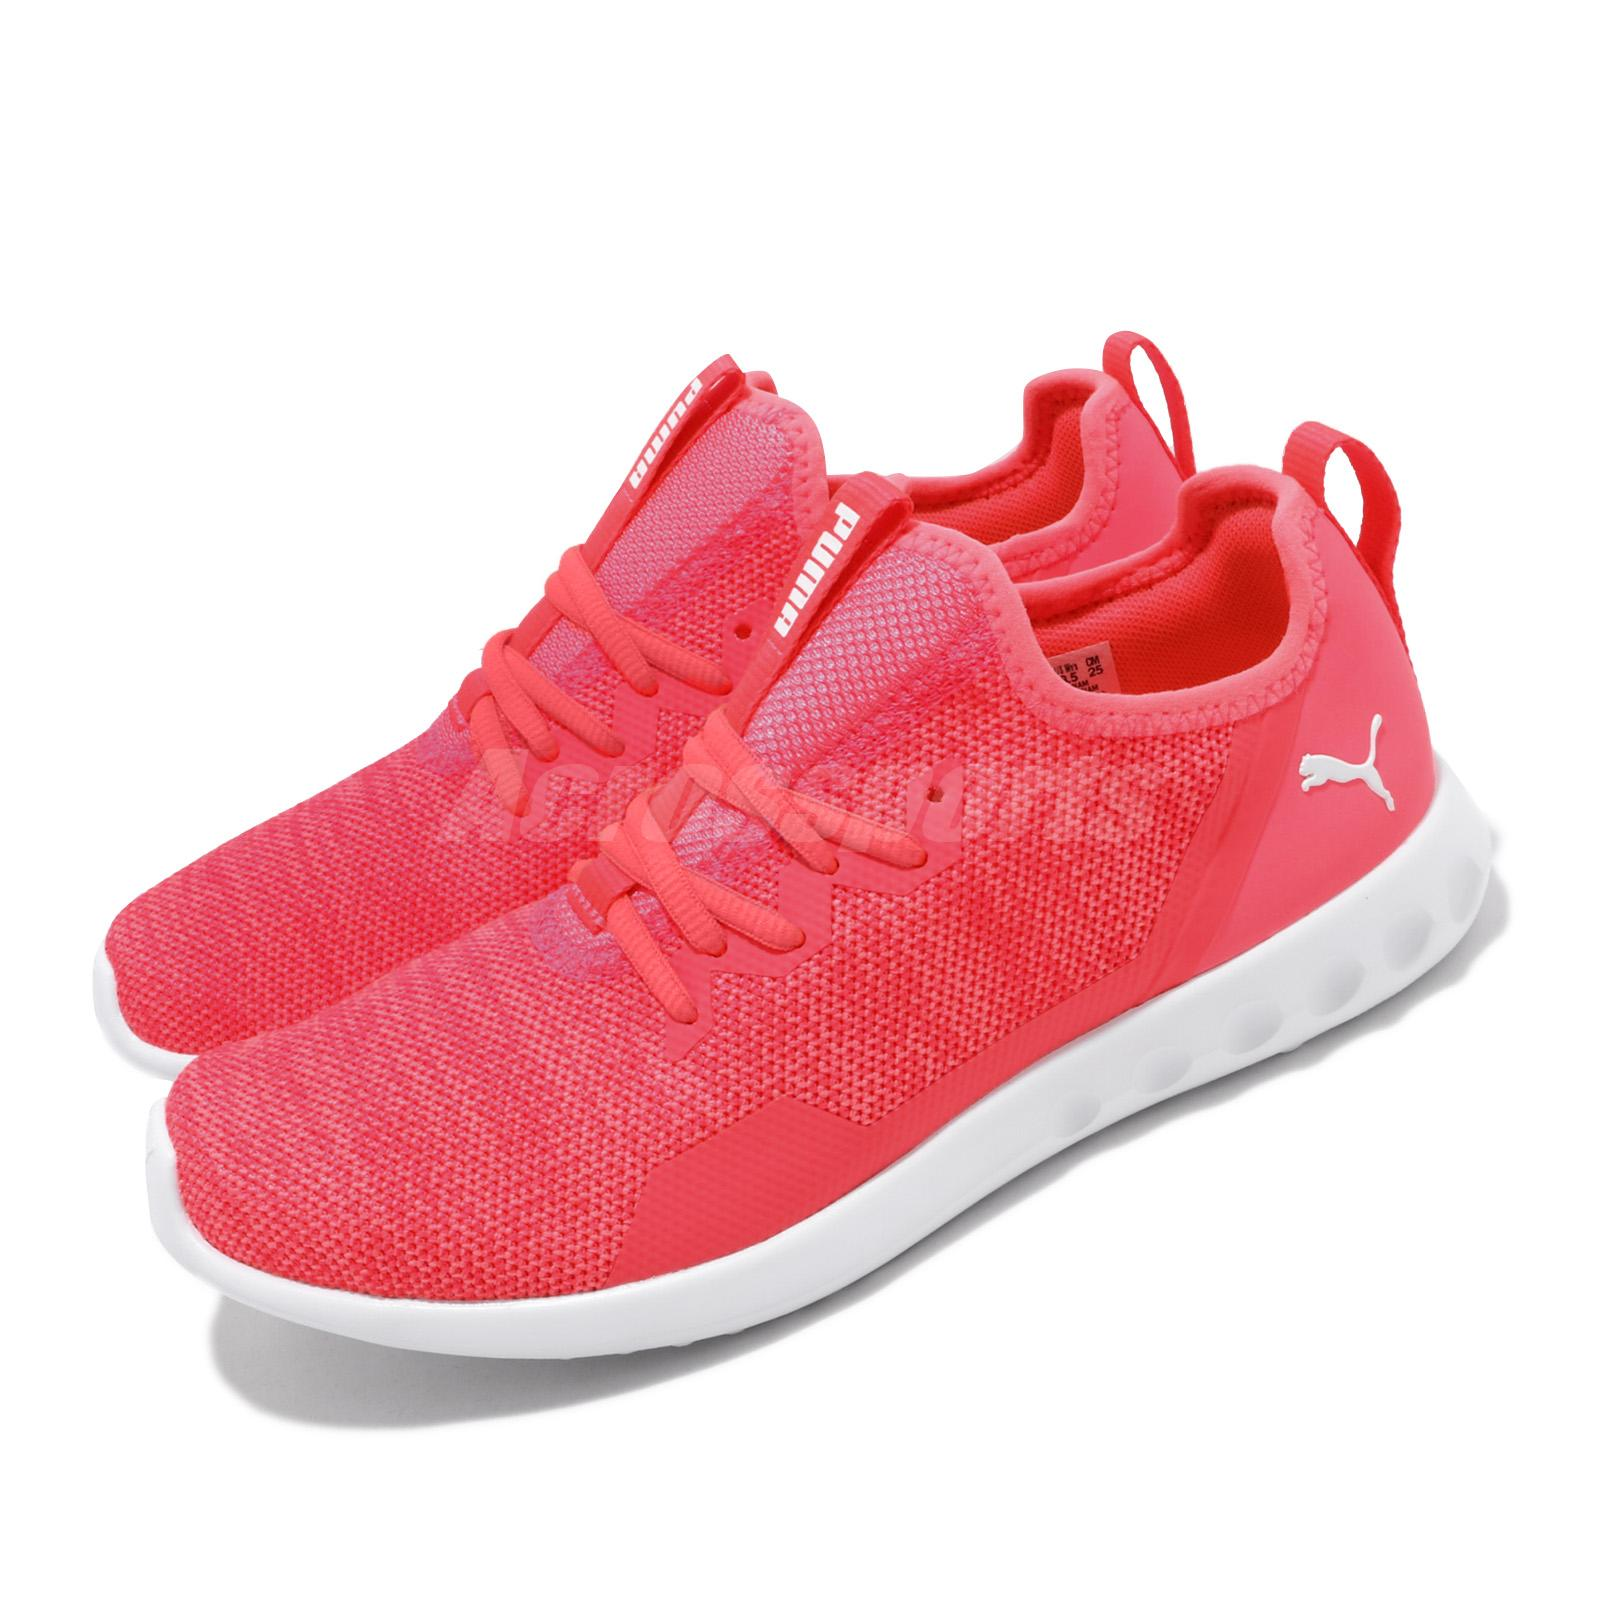 Puma Carson 2 X Knit Wns Pink White